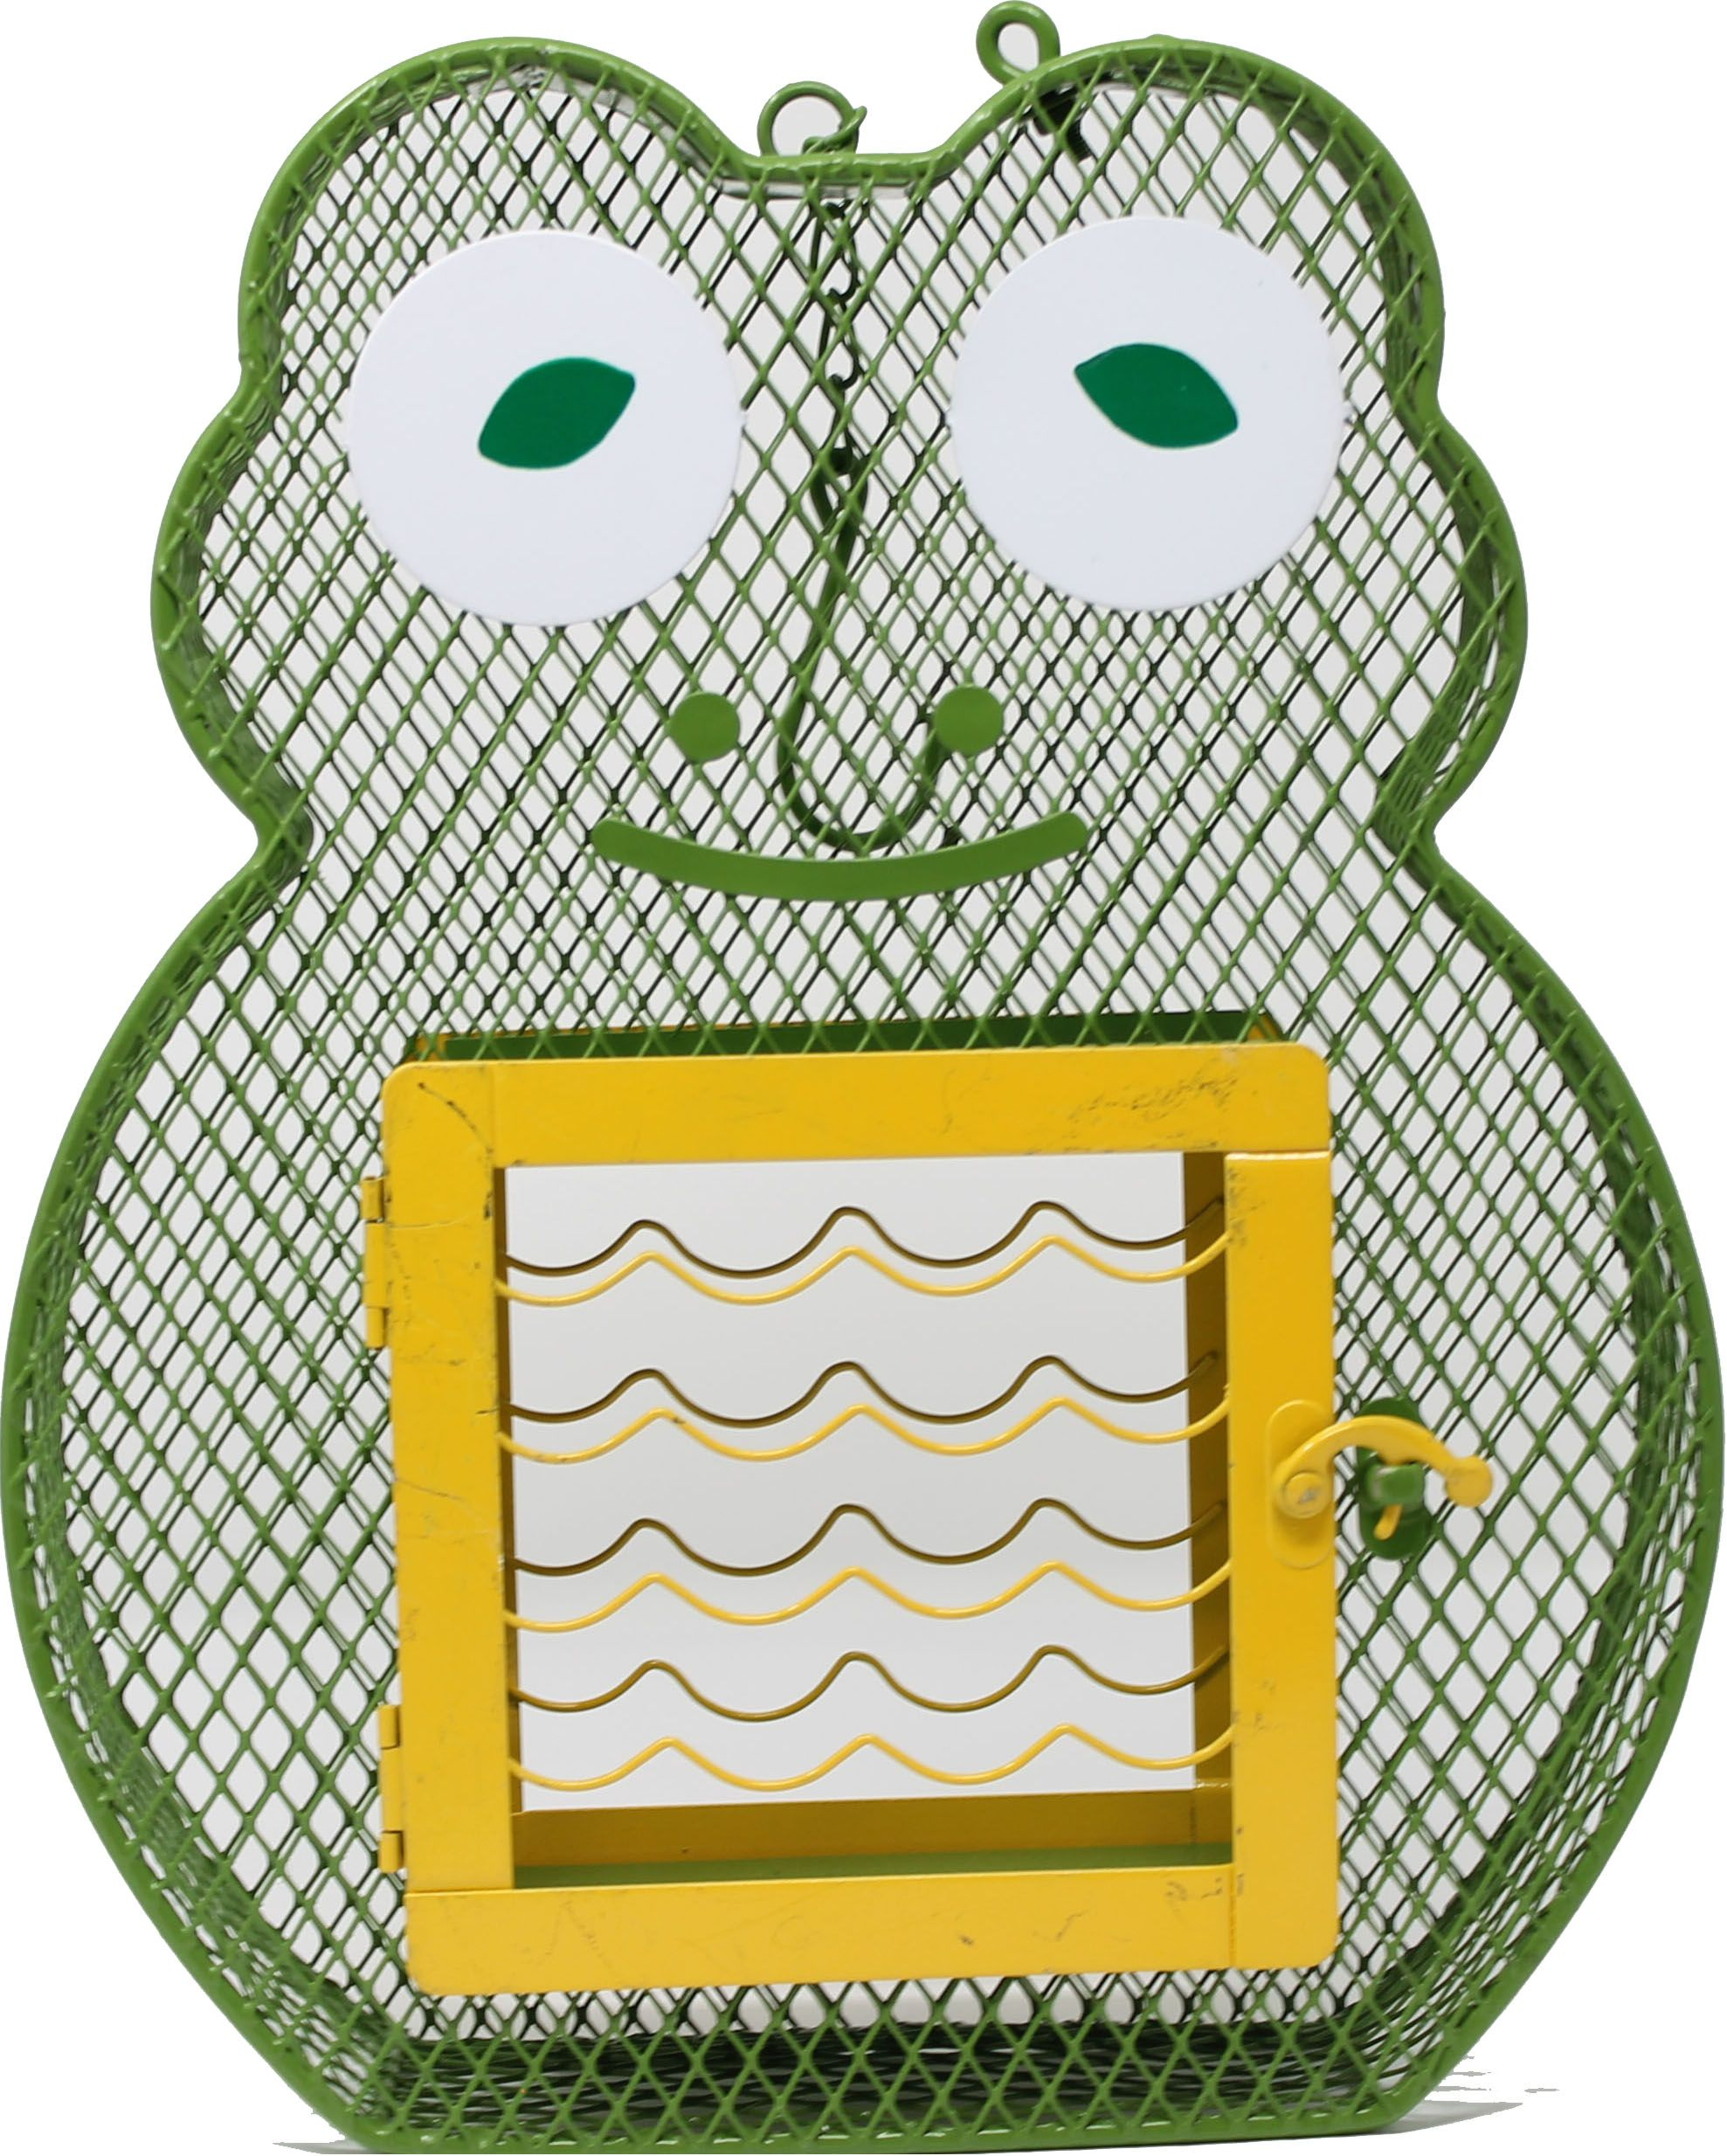 Birds frog suet and seed feeder by heath suet feeder